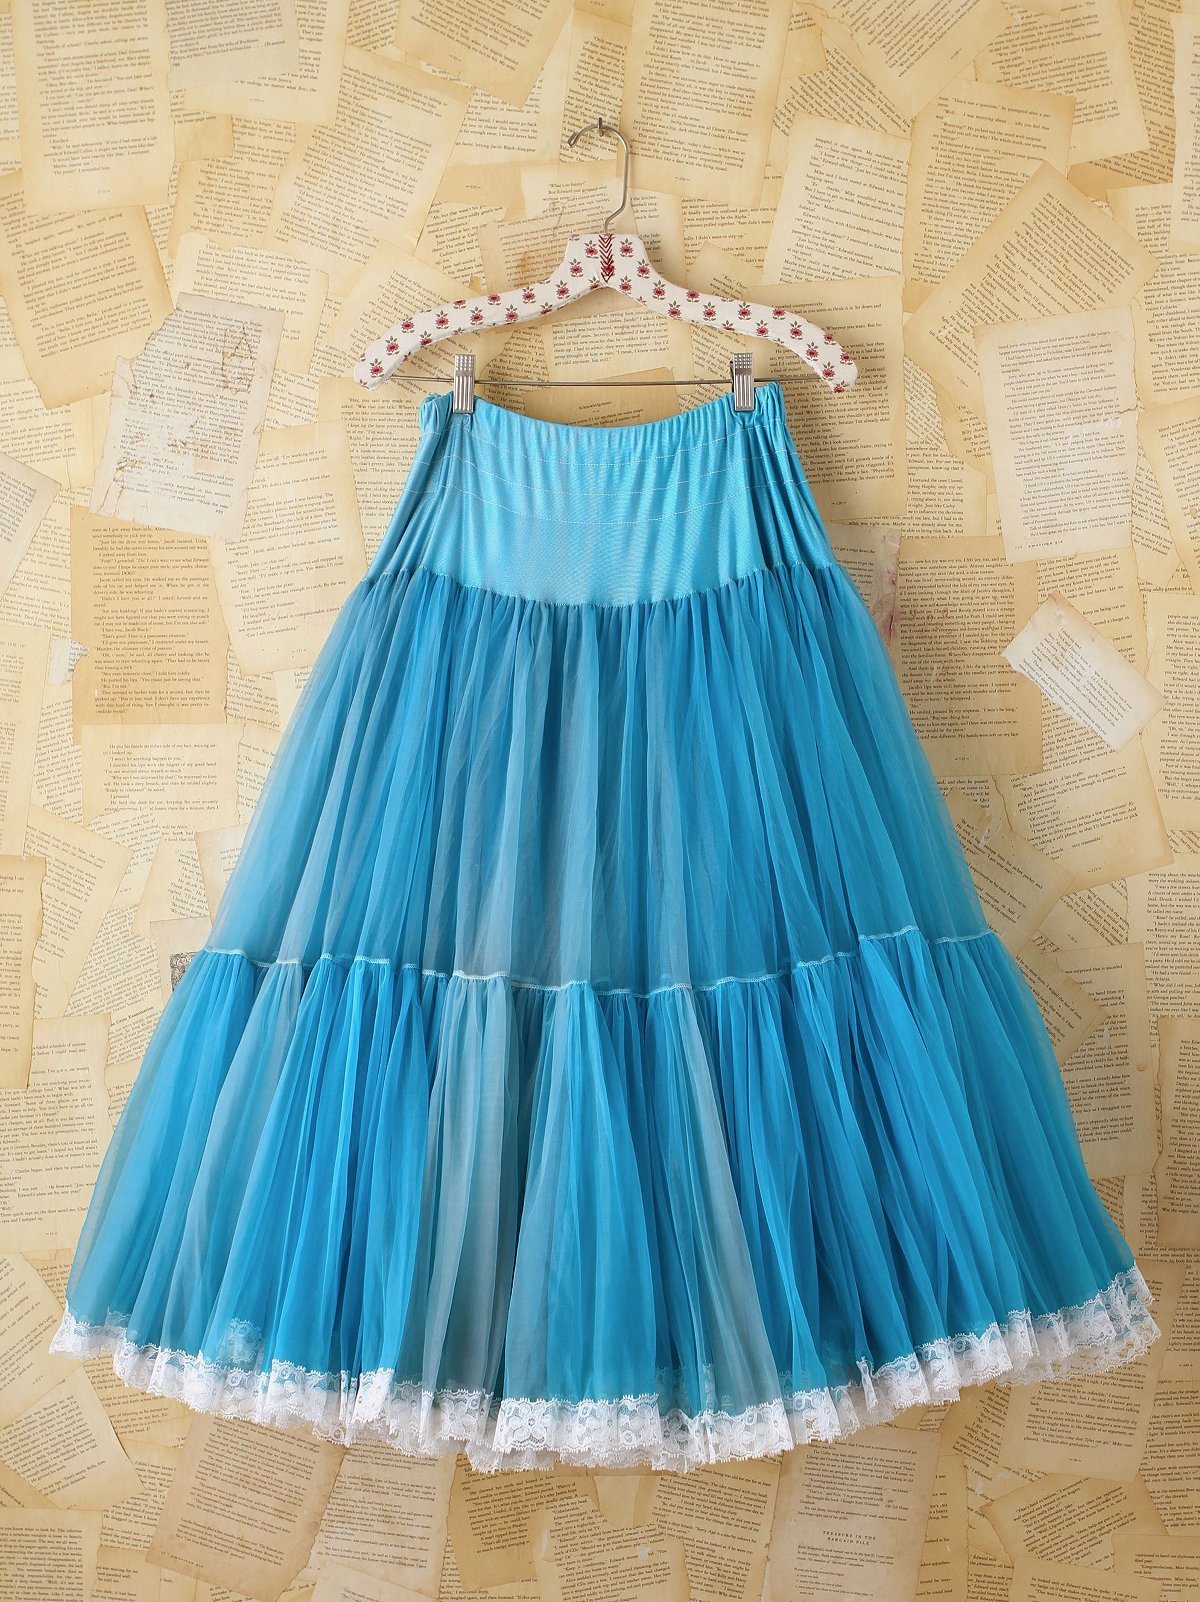 Vintage Blue Layered Mesh Skirt